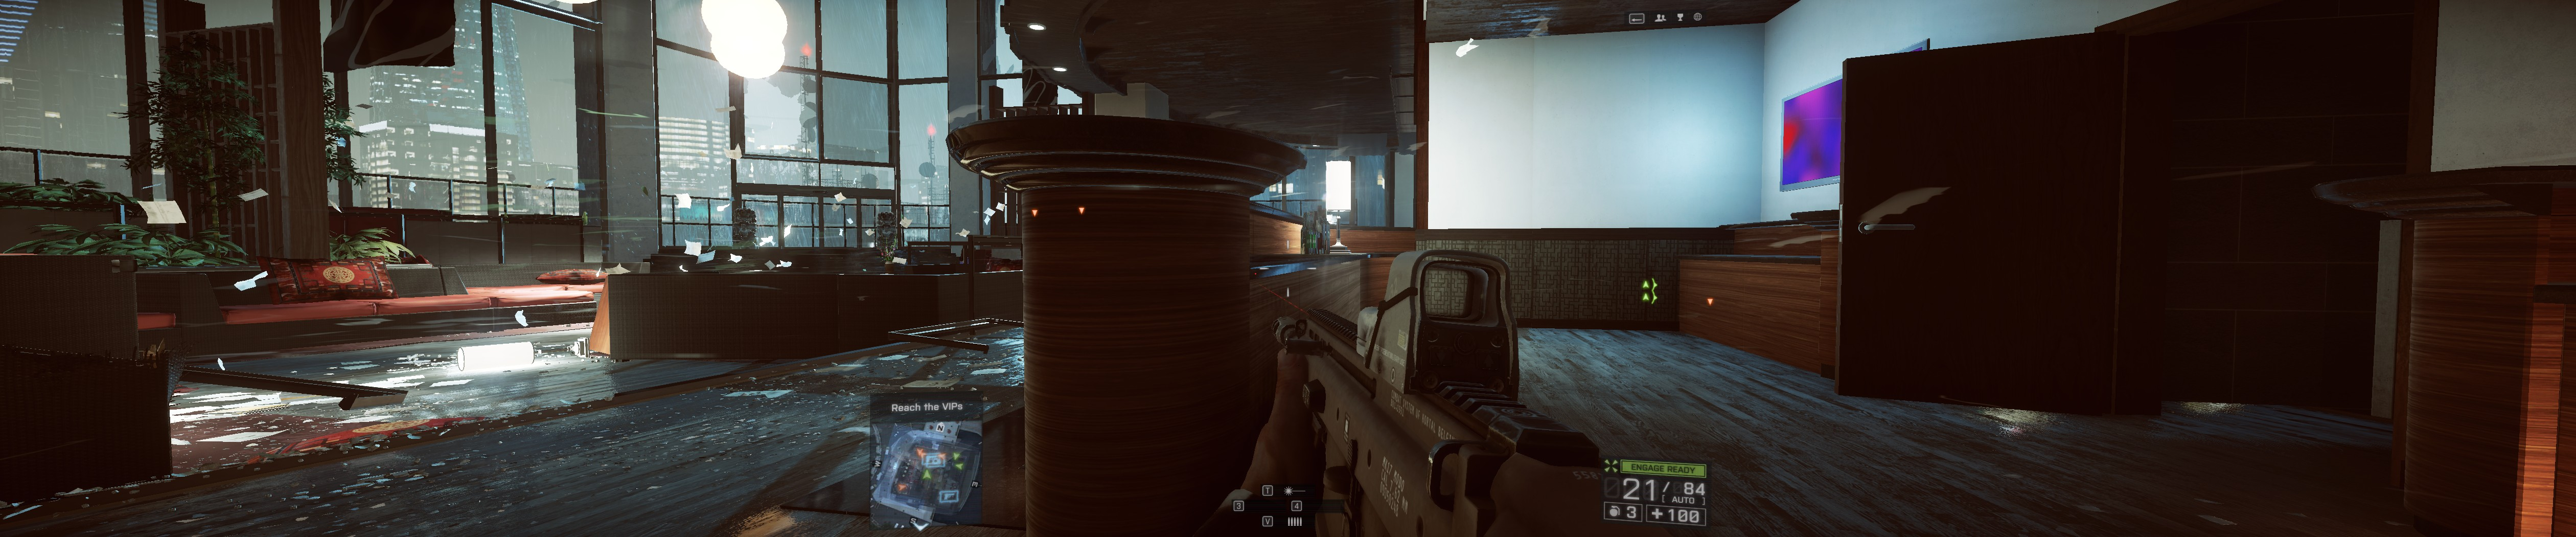 View topic - Battlefield 4 (Triple Monitors / Eyefinity / Surround